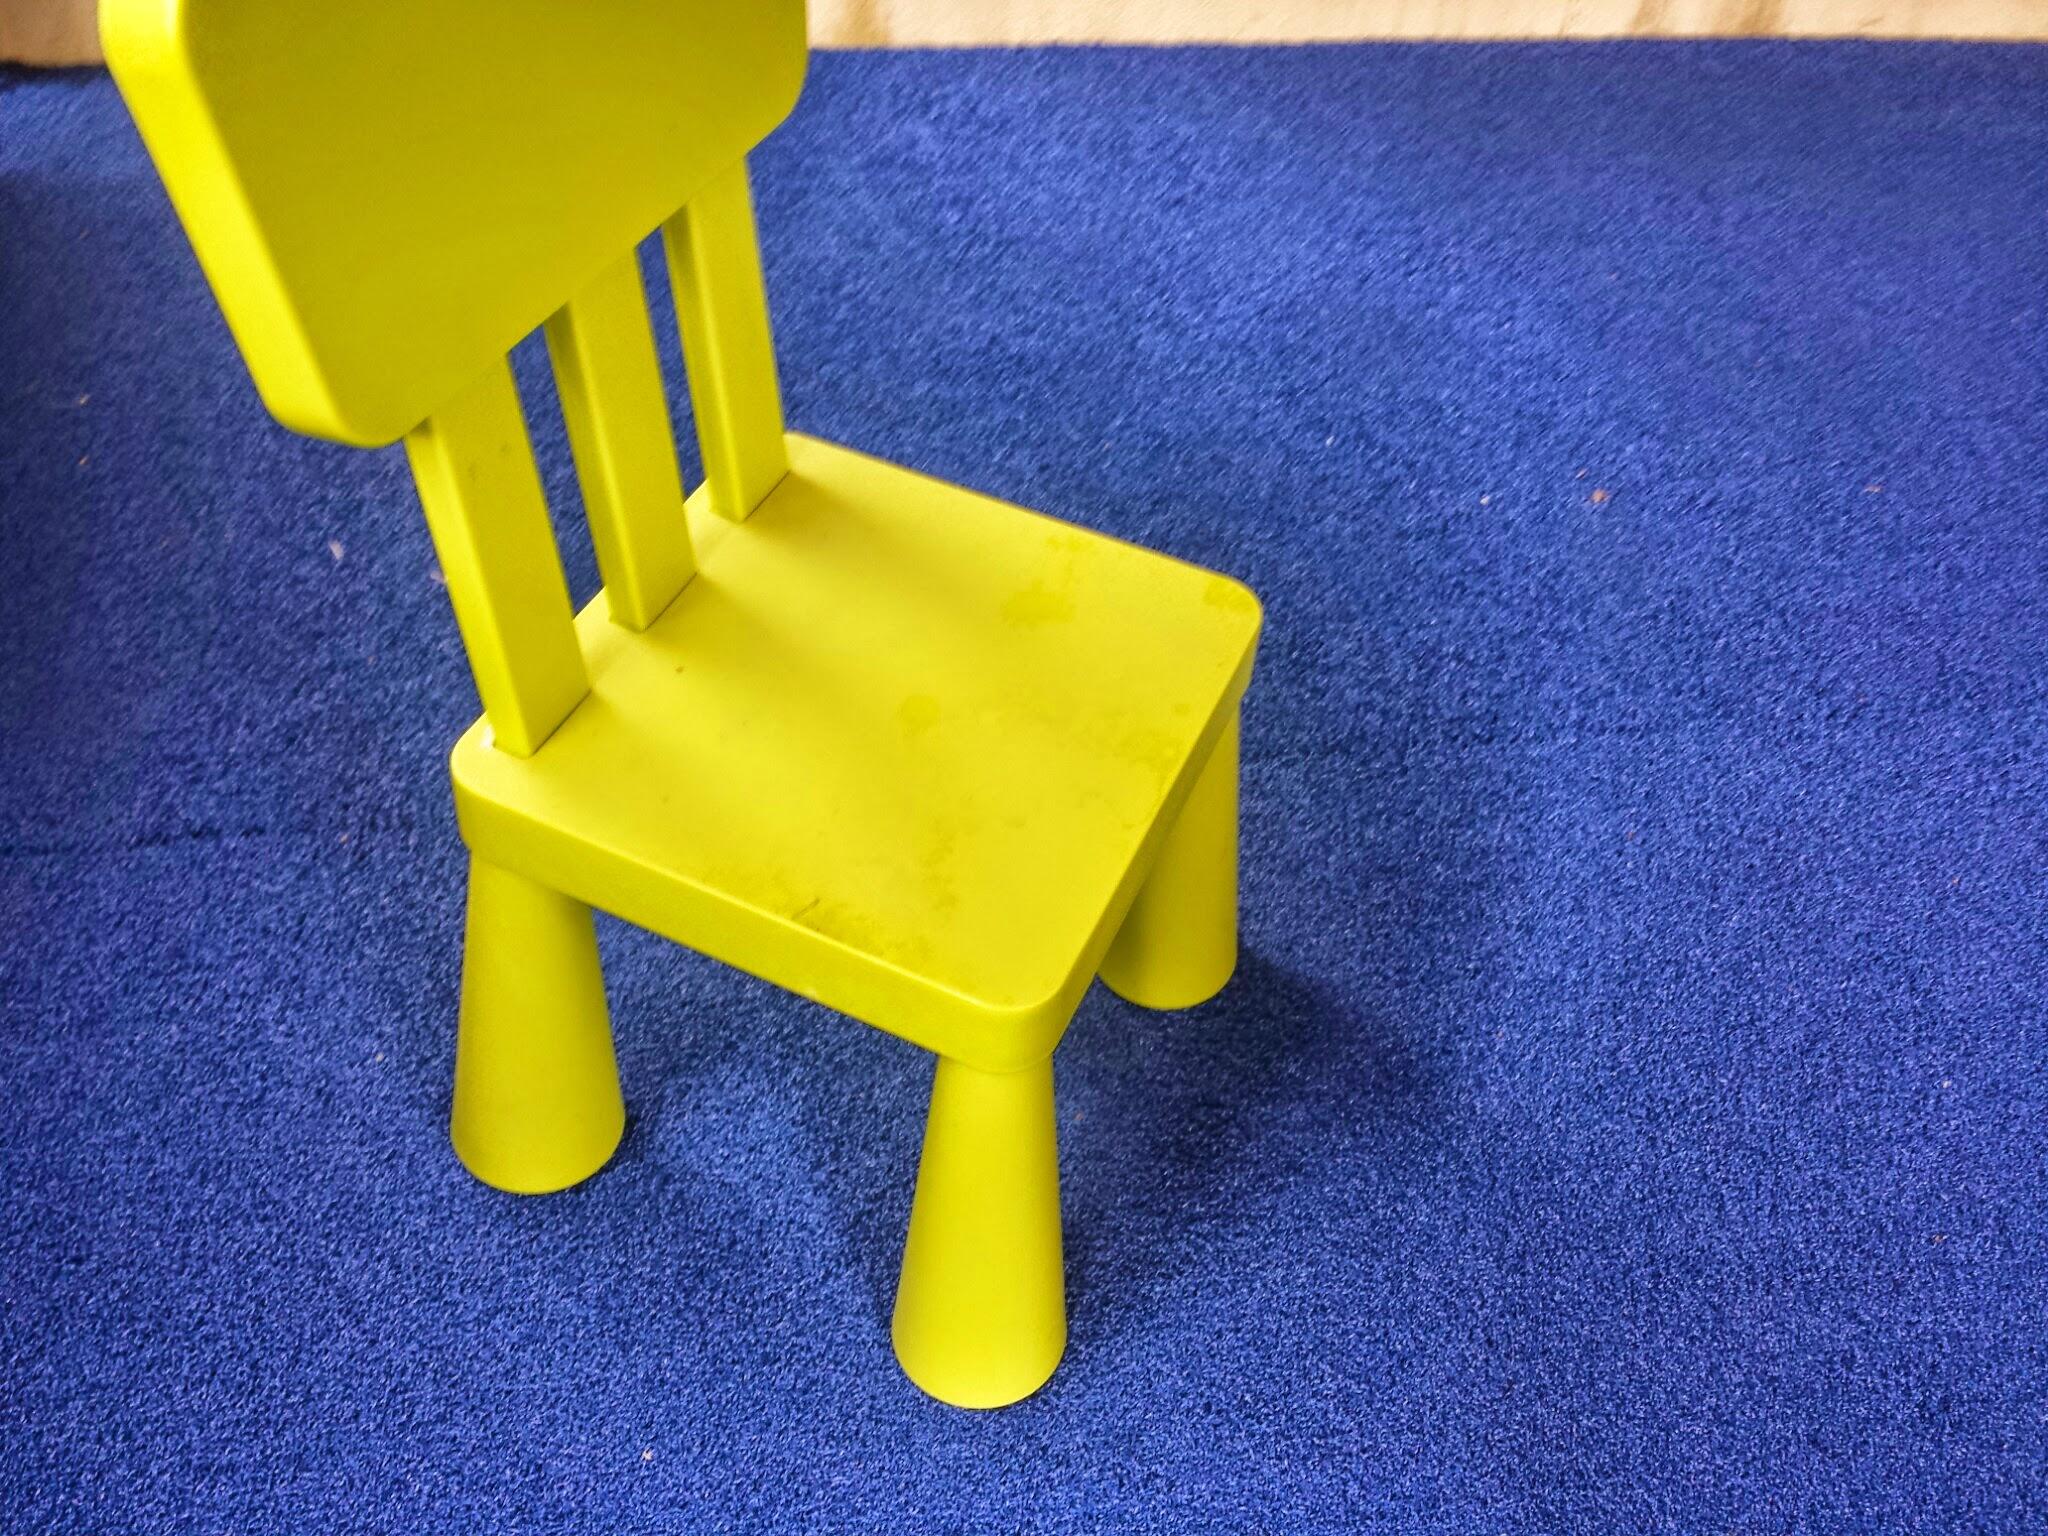 chair and bluegrass